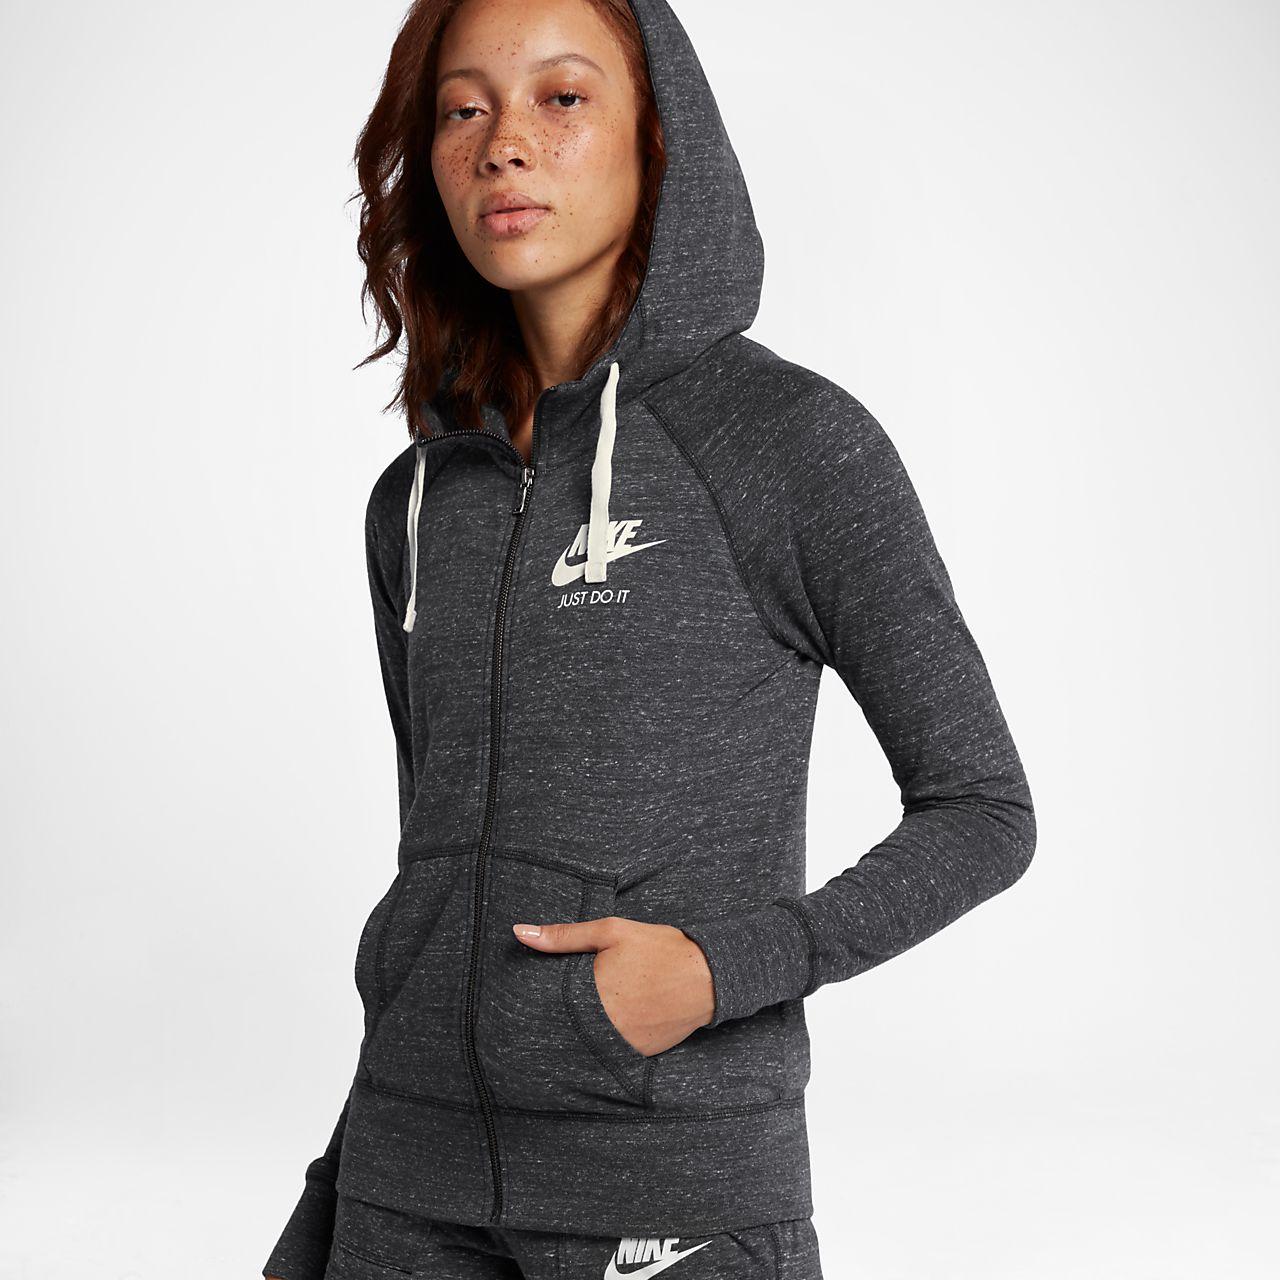 Nike Sportswear Gym Vintage Dessuadora amb caputxa i cremallera completa - Dona